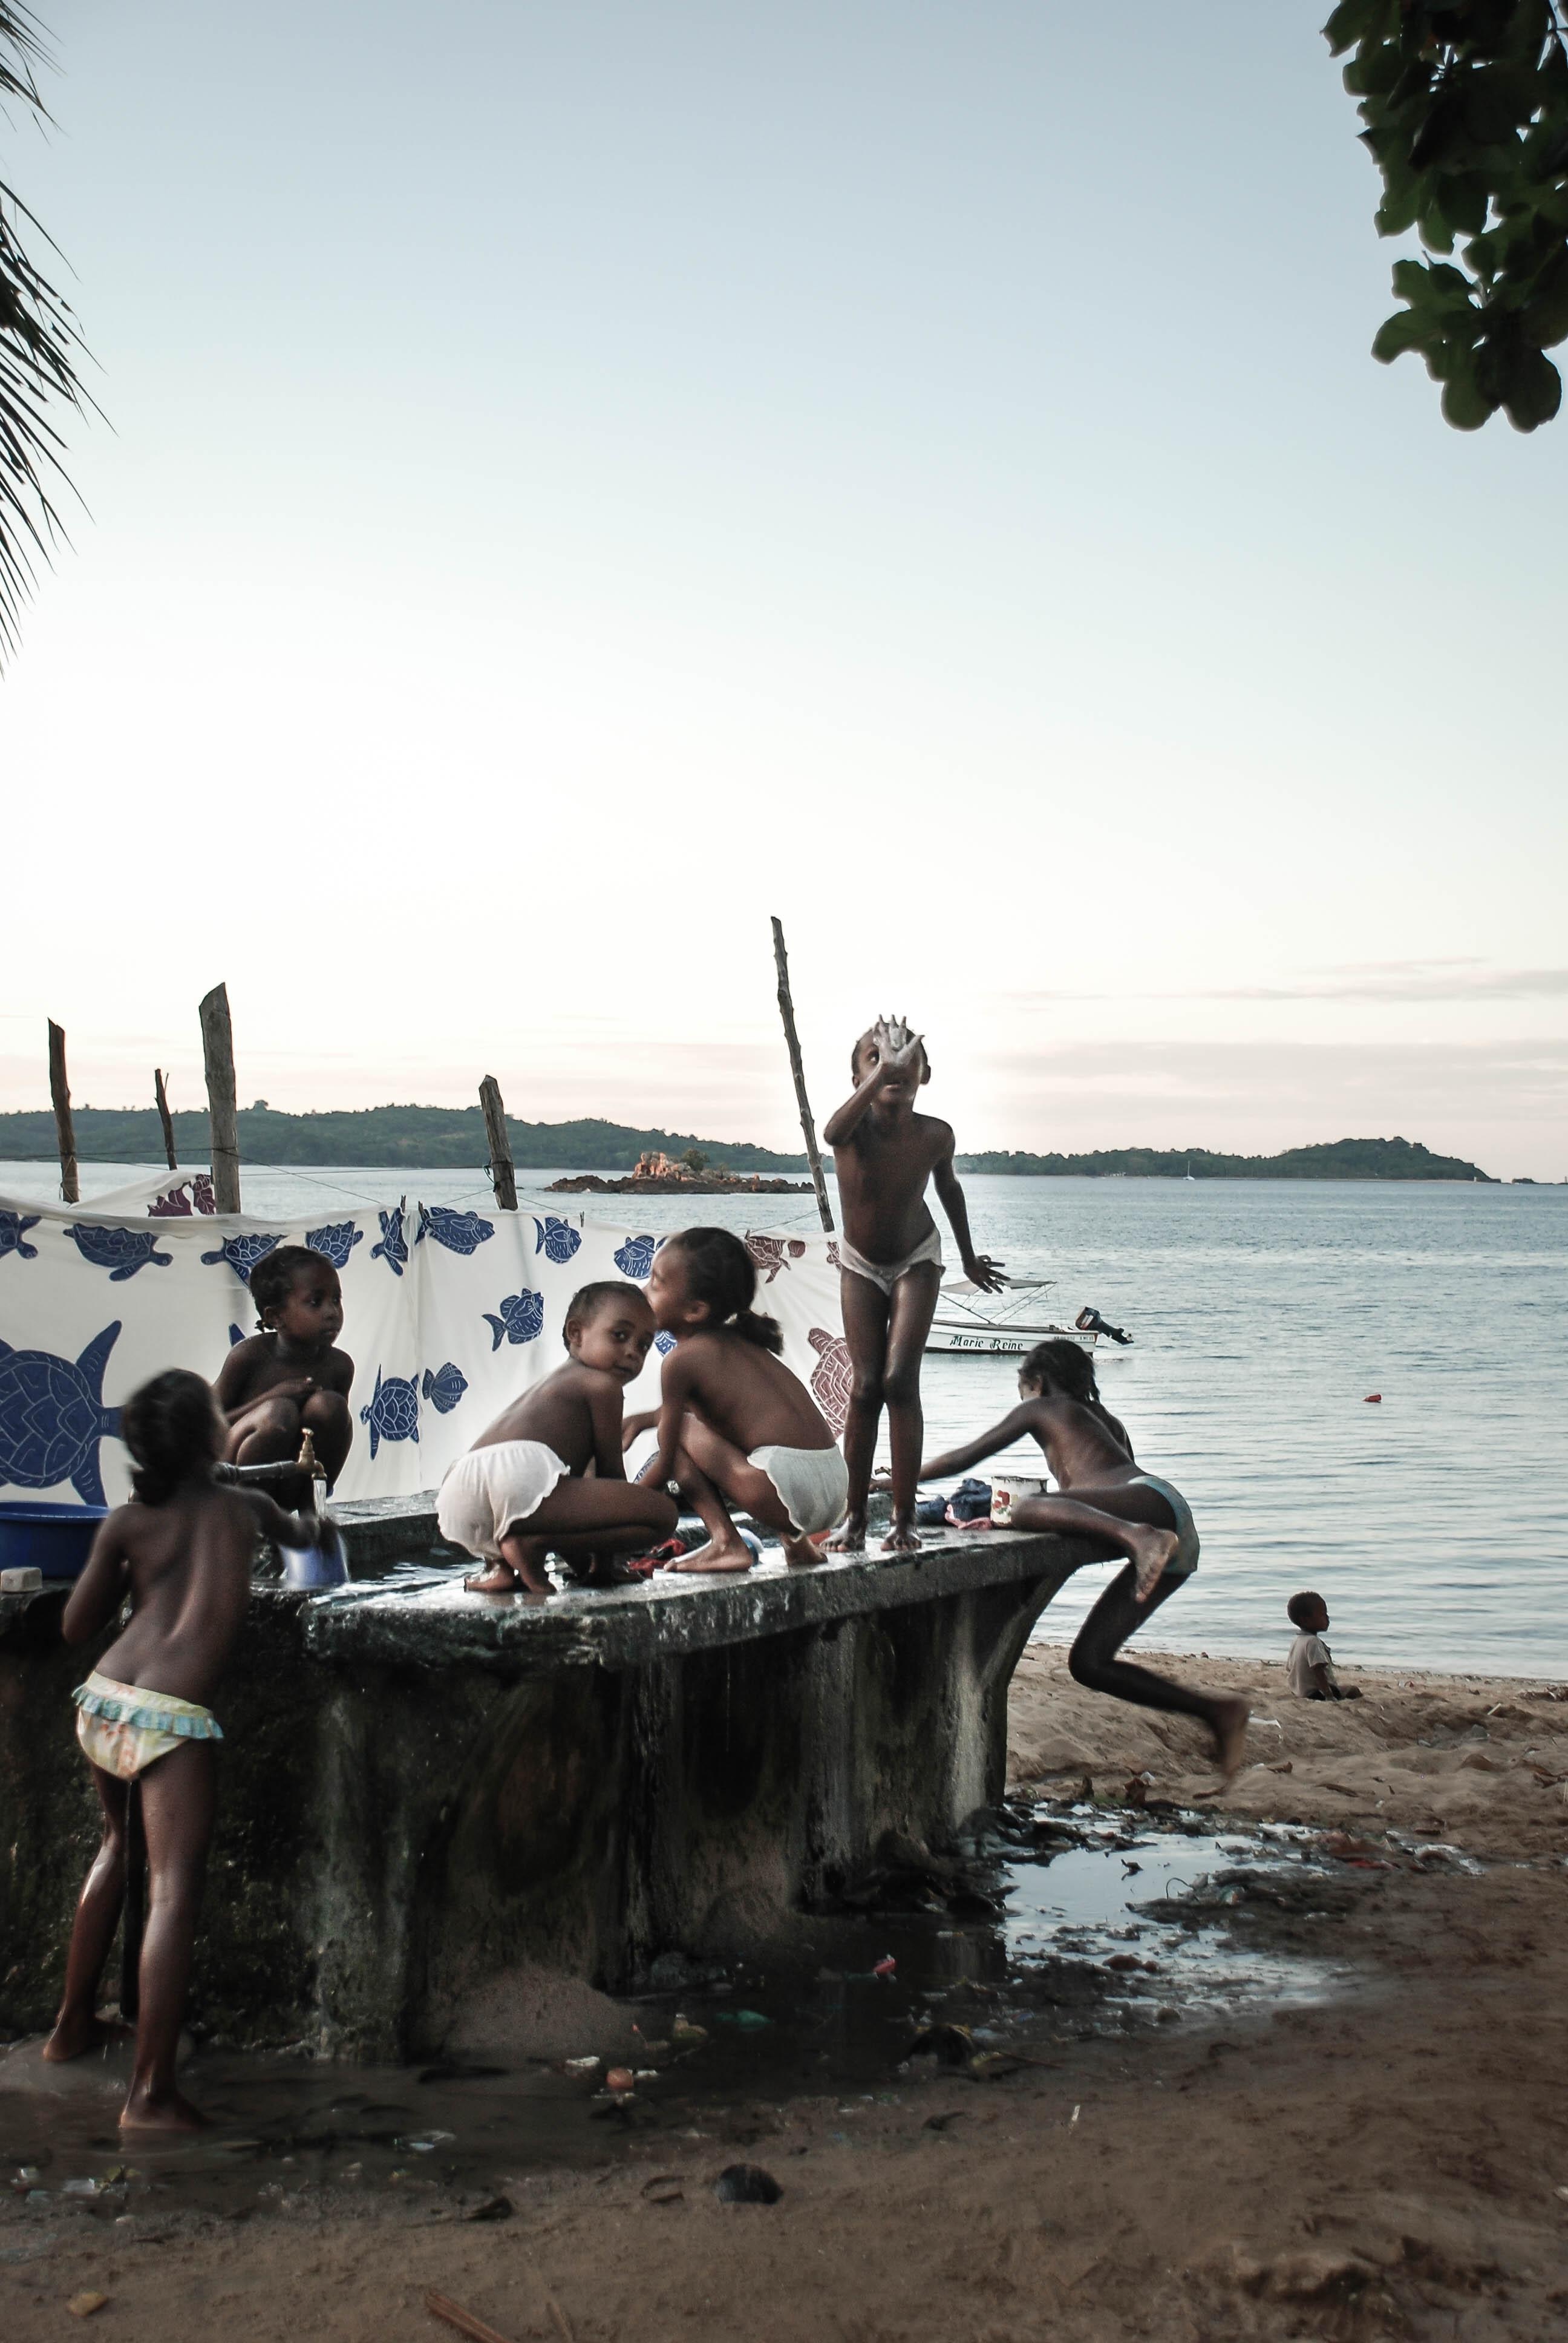 Photographe,voyage,documentaire,shooting photo,ile,ile,voyage,studio le carre,voyage,reunion,ocean indien,ile,documentaire,reunion,voyage,strasbourg,monde